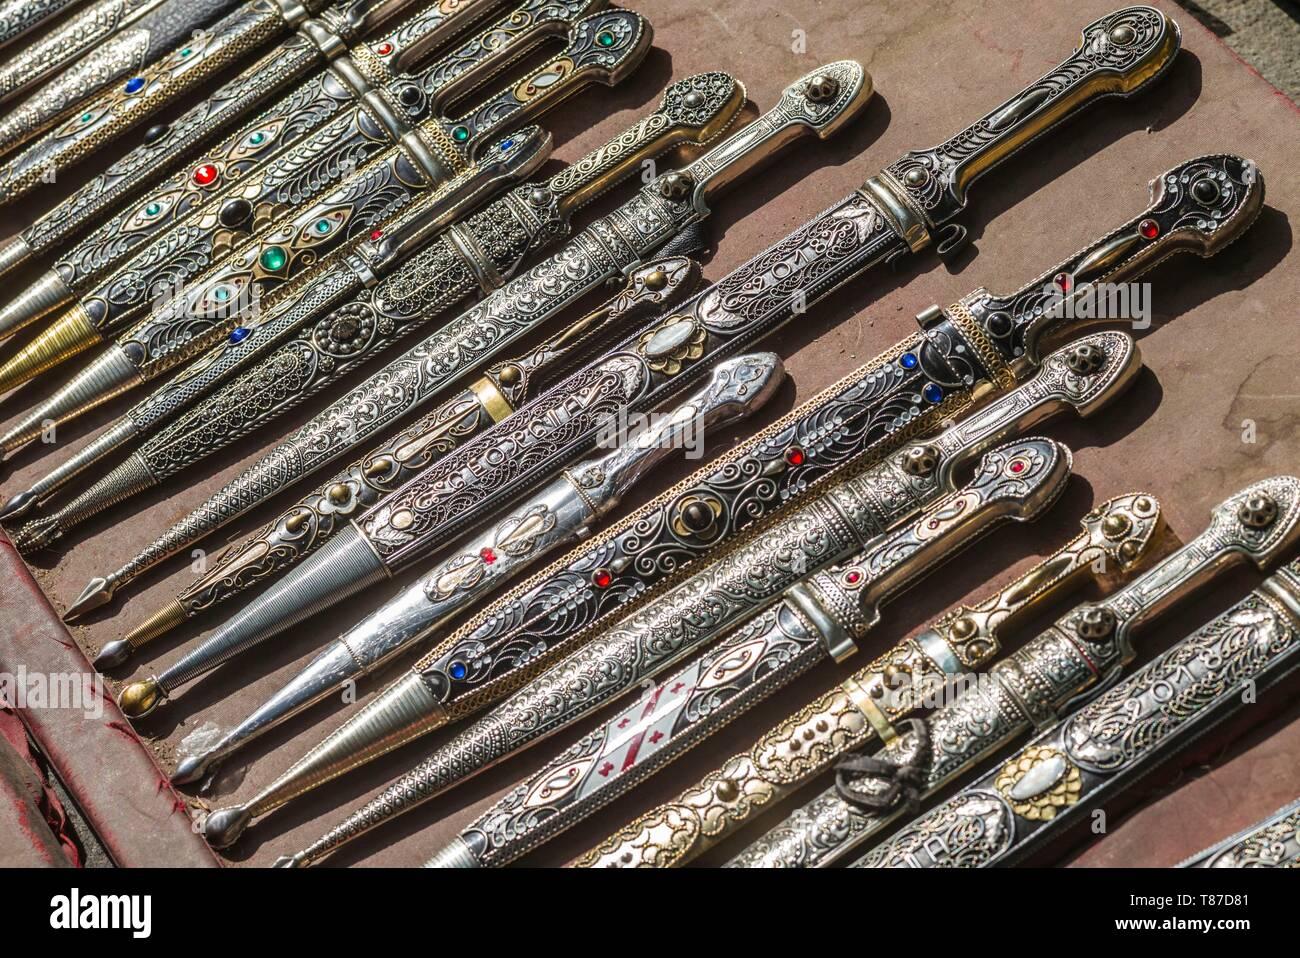 Georgia, Tbilisi, Rustaveli Avenue, souvenirs, traditional Georgian daggers - Stock Image